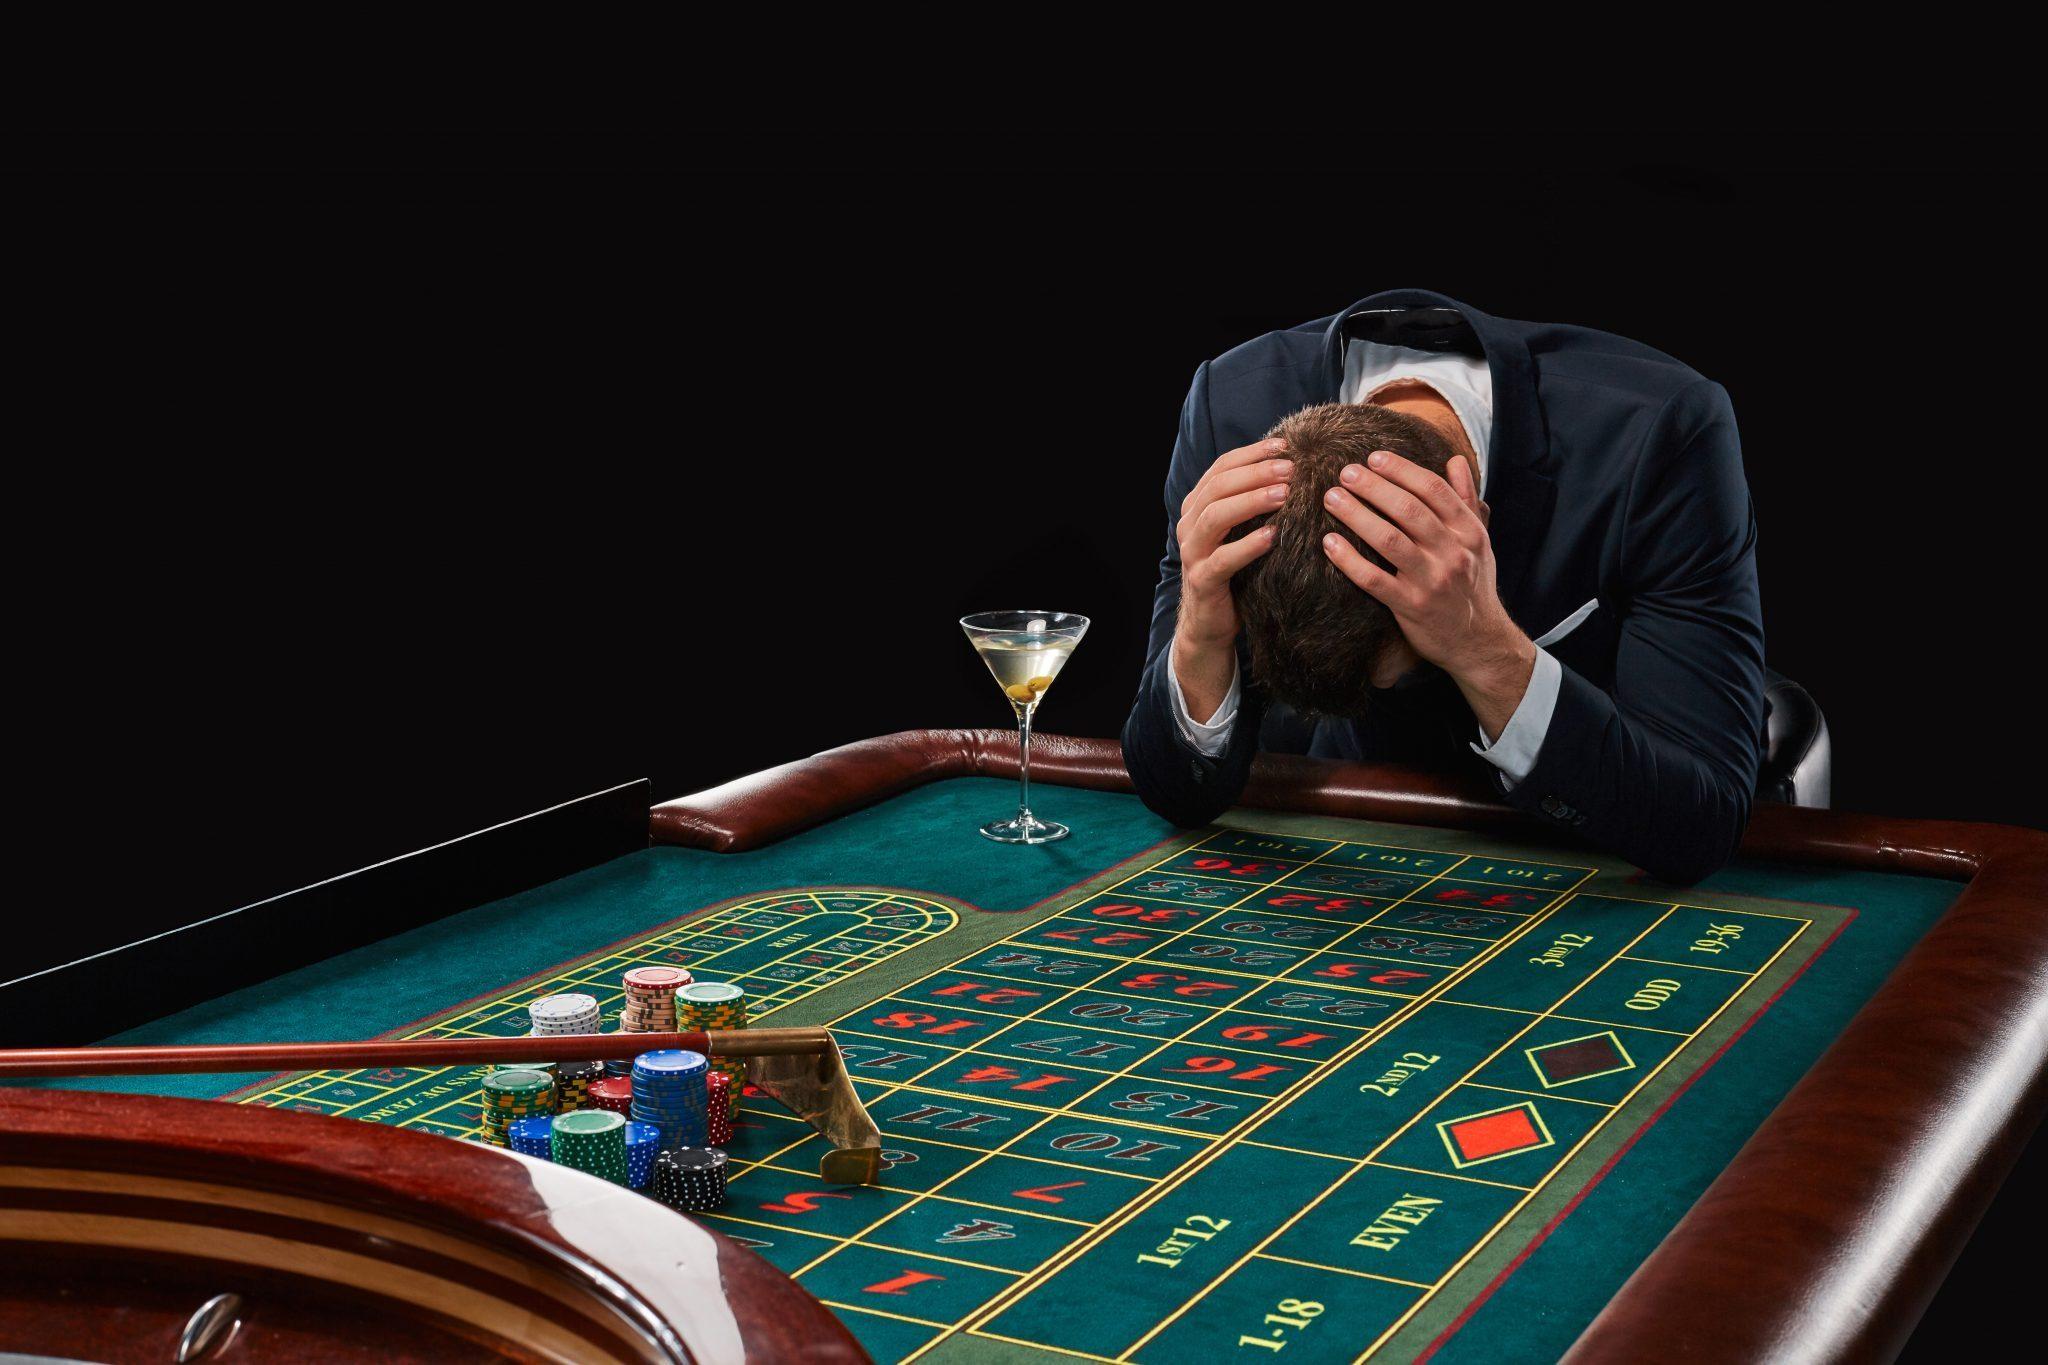 Gambling Can Be an Addiction